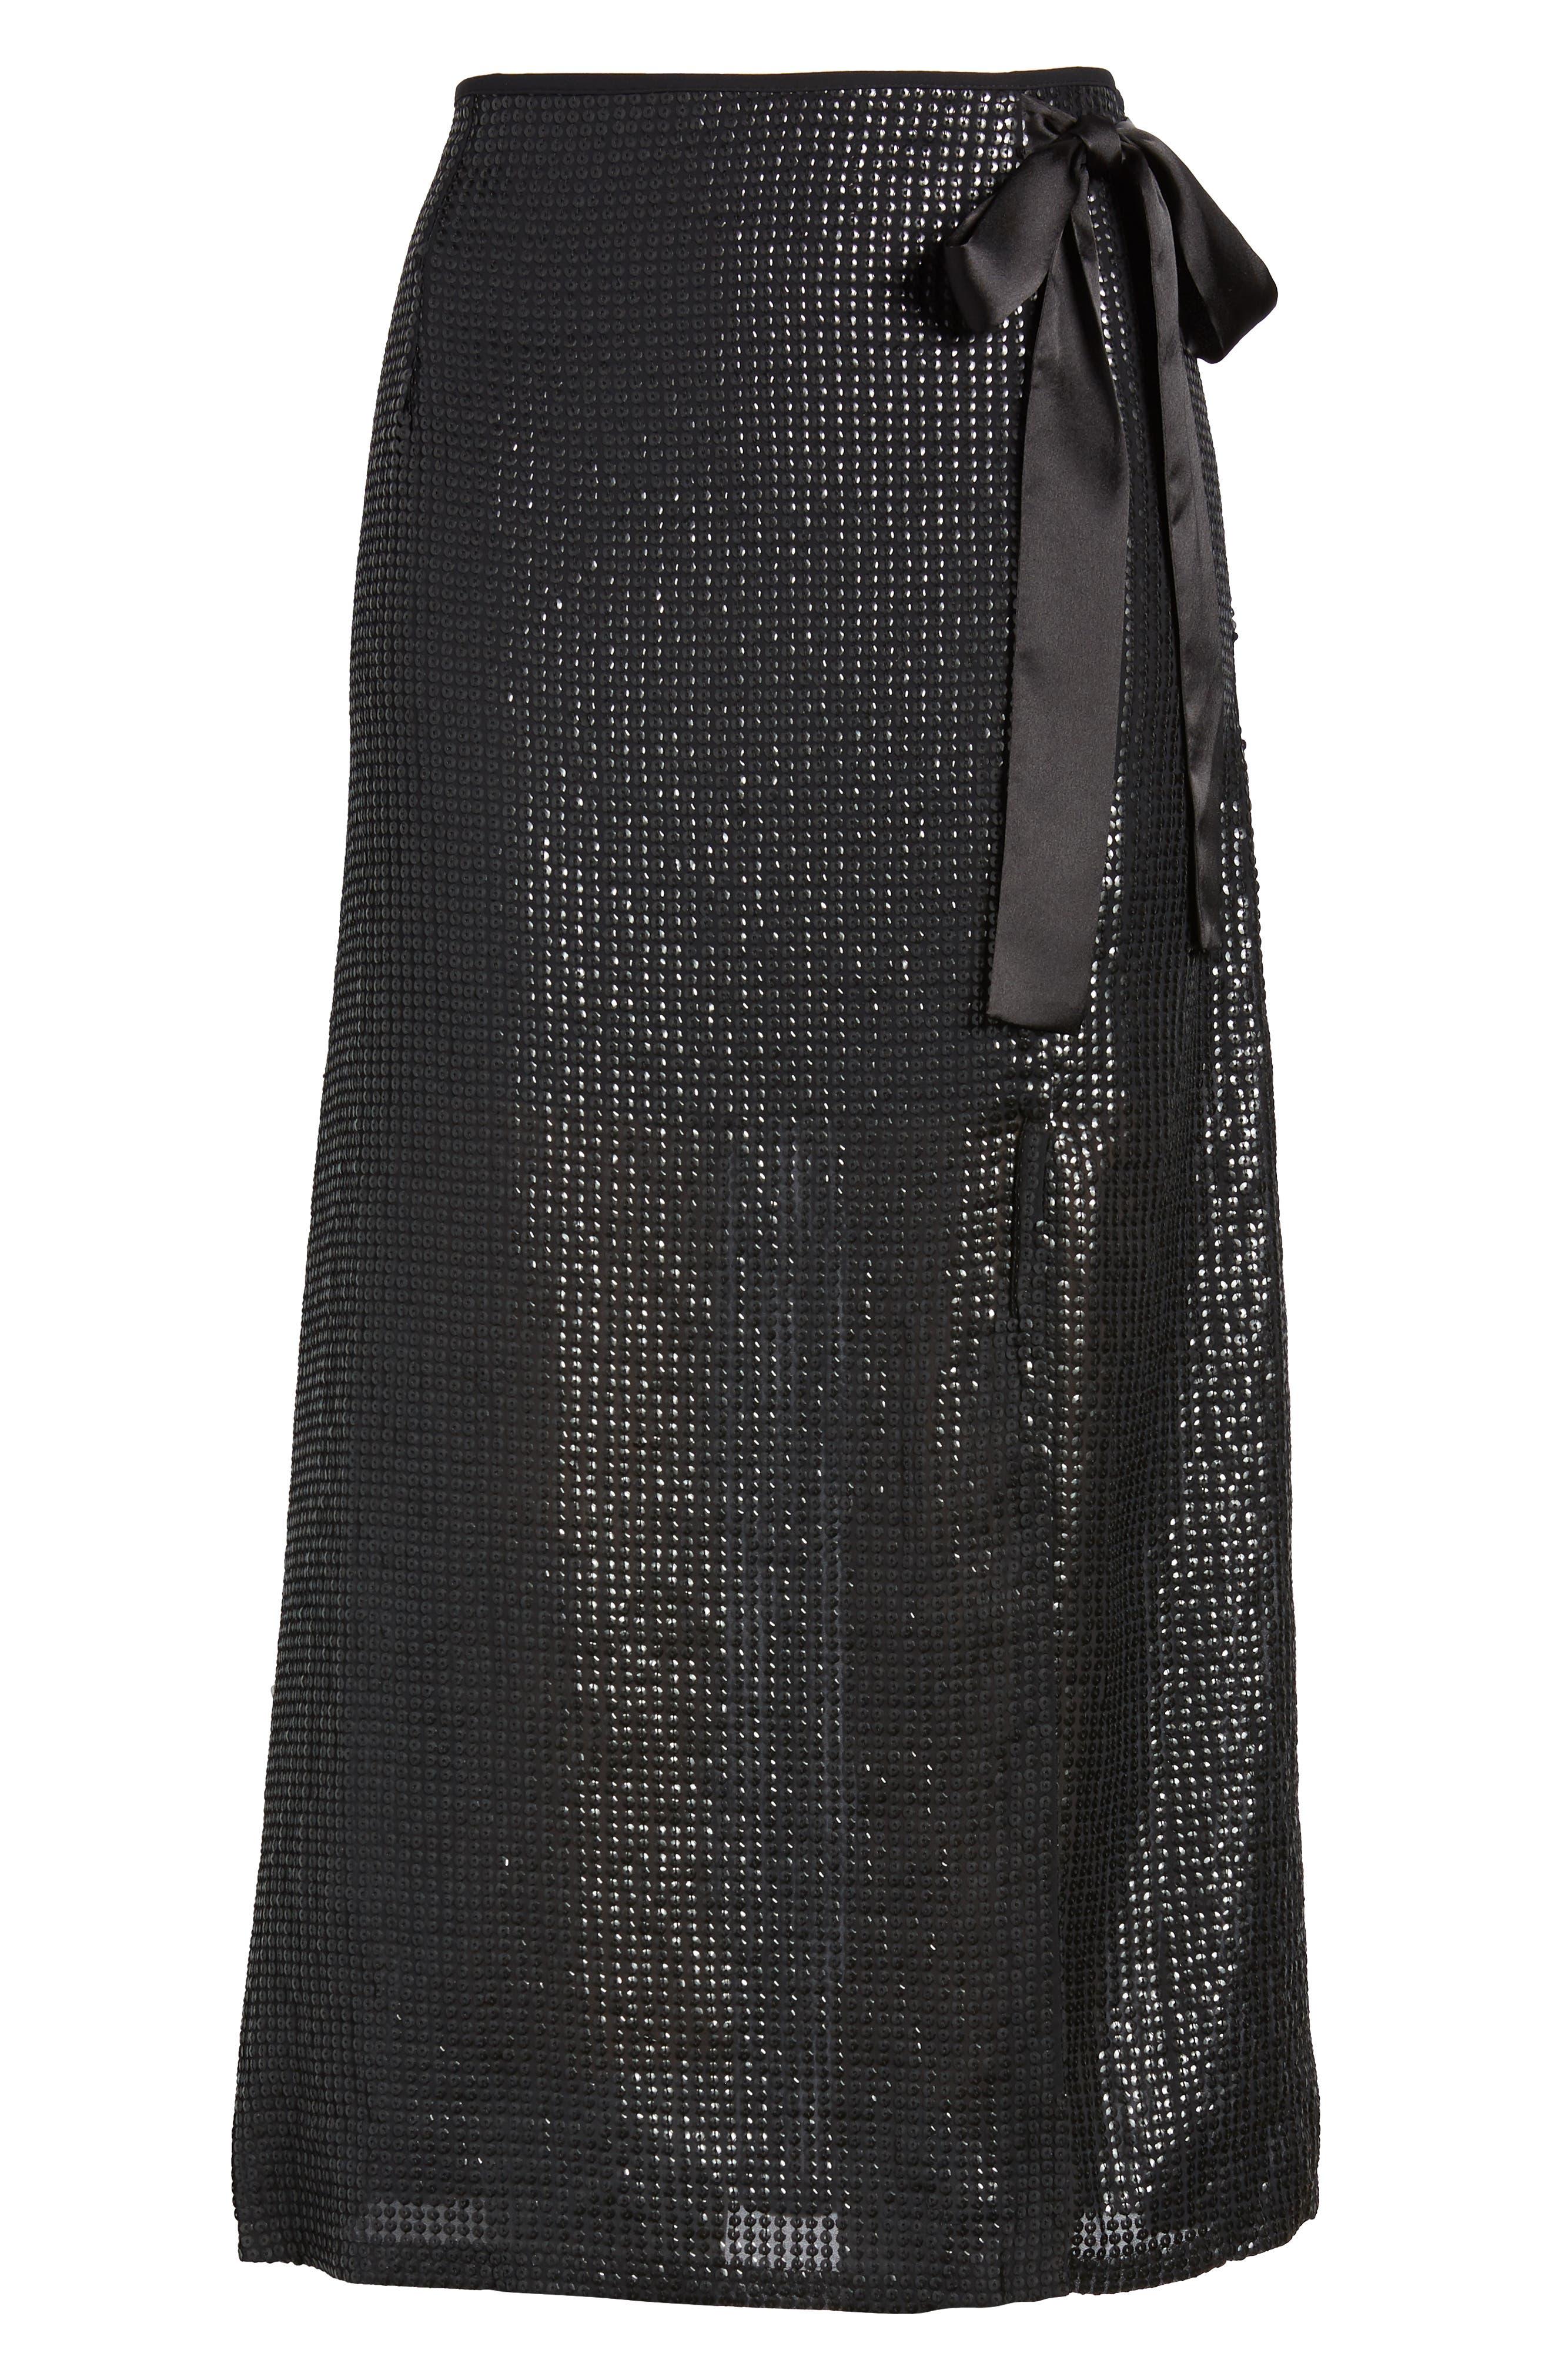 Wrap Sequin Midi Skirt,                             Alternate thumbnail 6, color,                             BLACK SEQUIN